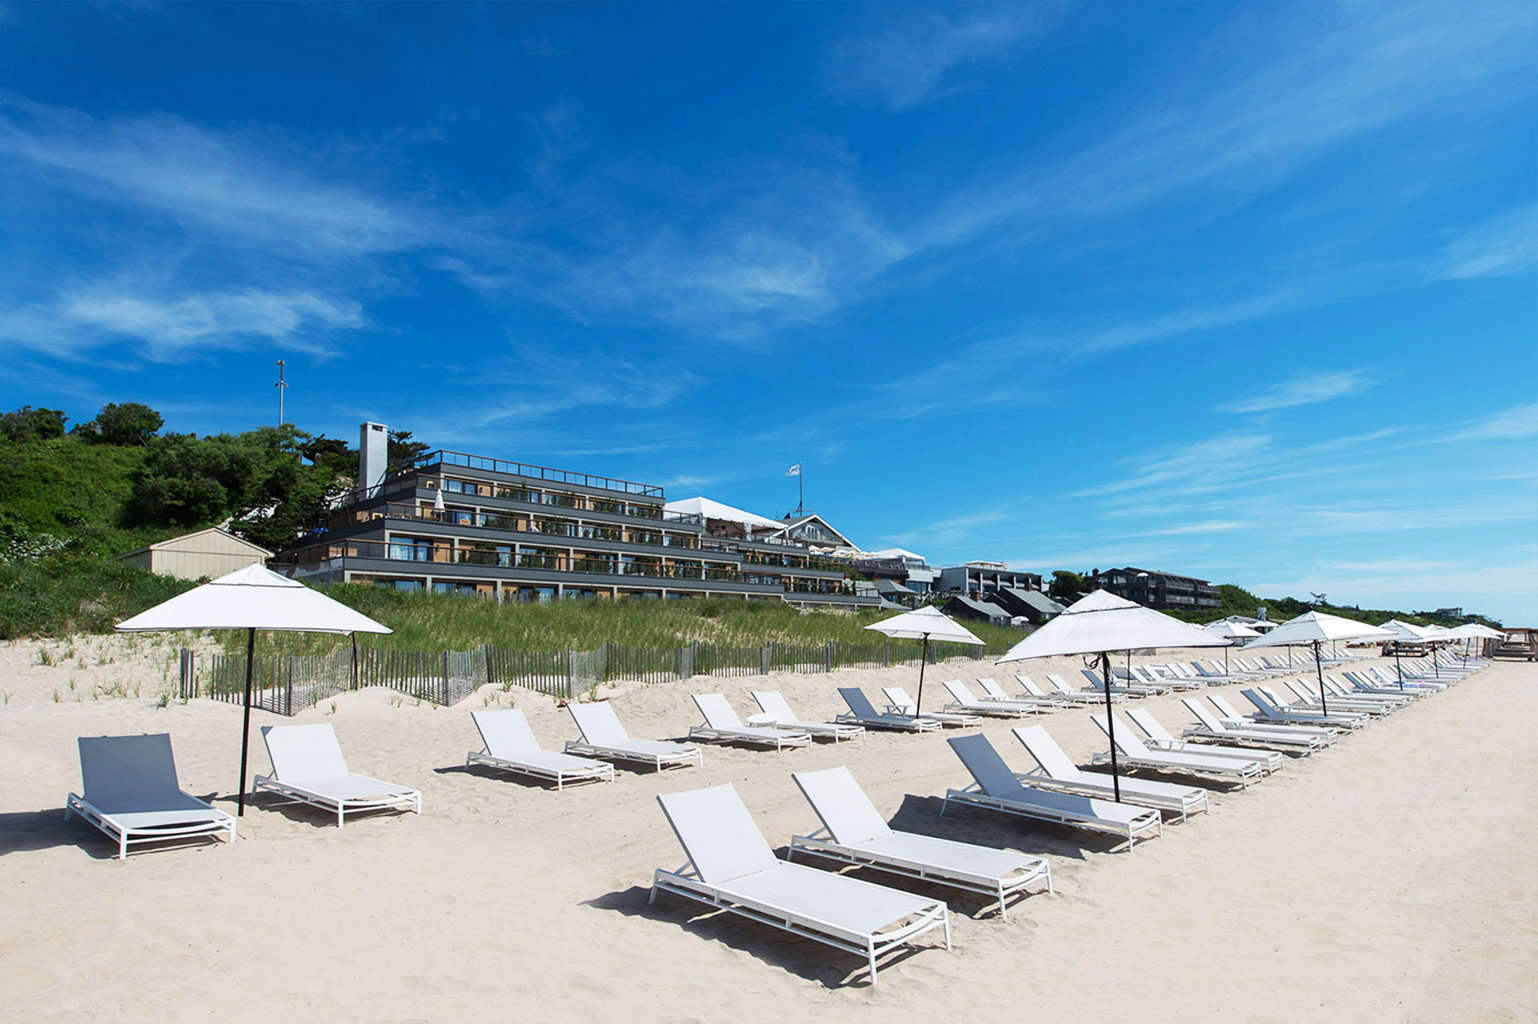 Beach Exterior Hotels Resort sky umbrella chair Sea Coast shore Ocean lawn walkway dock marina boardwalk cape day sandy sunny lined shade